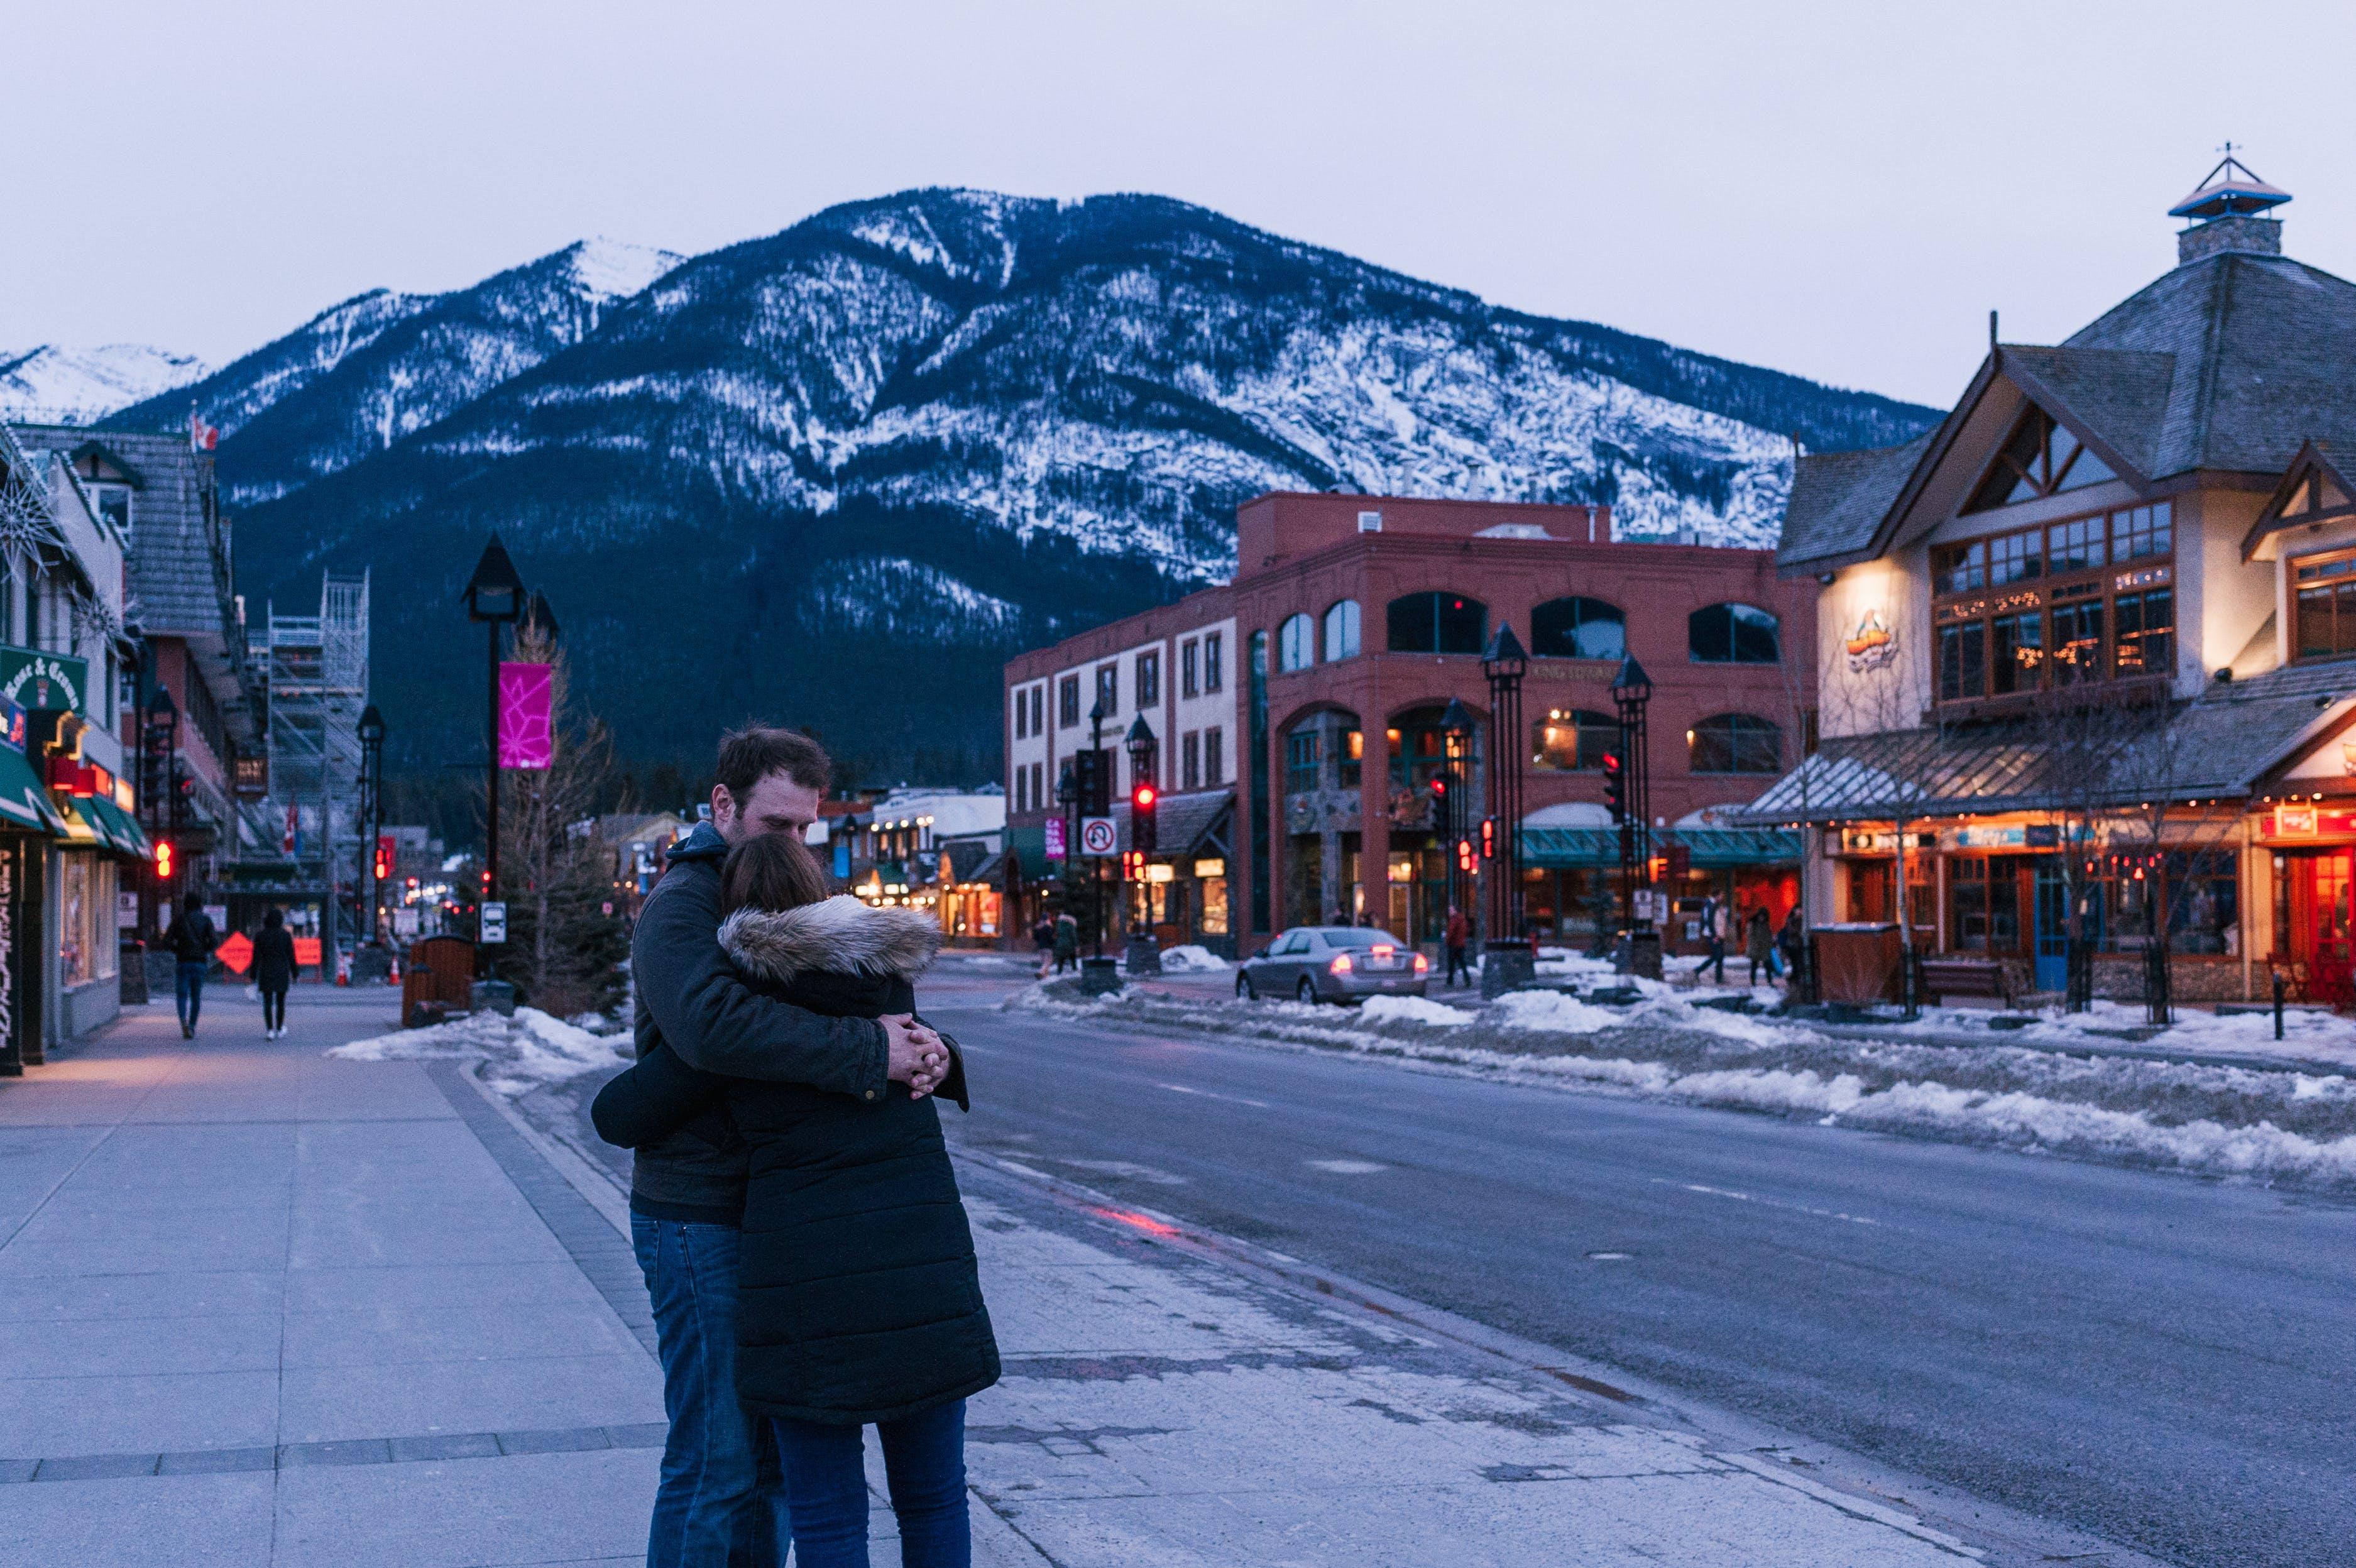 Man Hugging Woman on Street